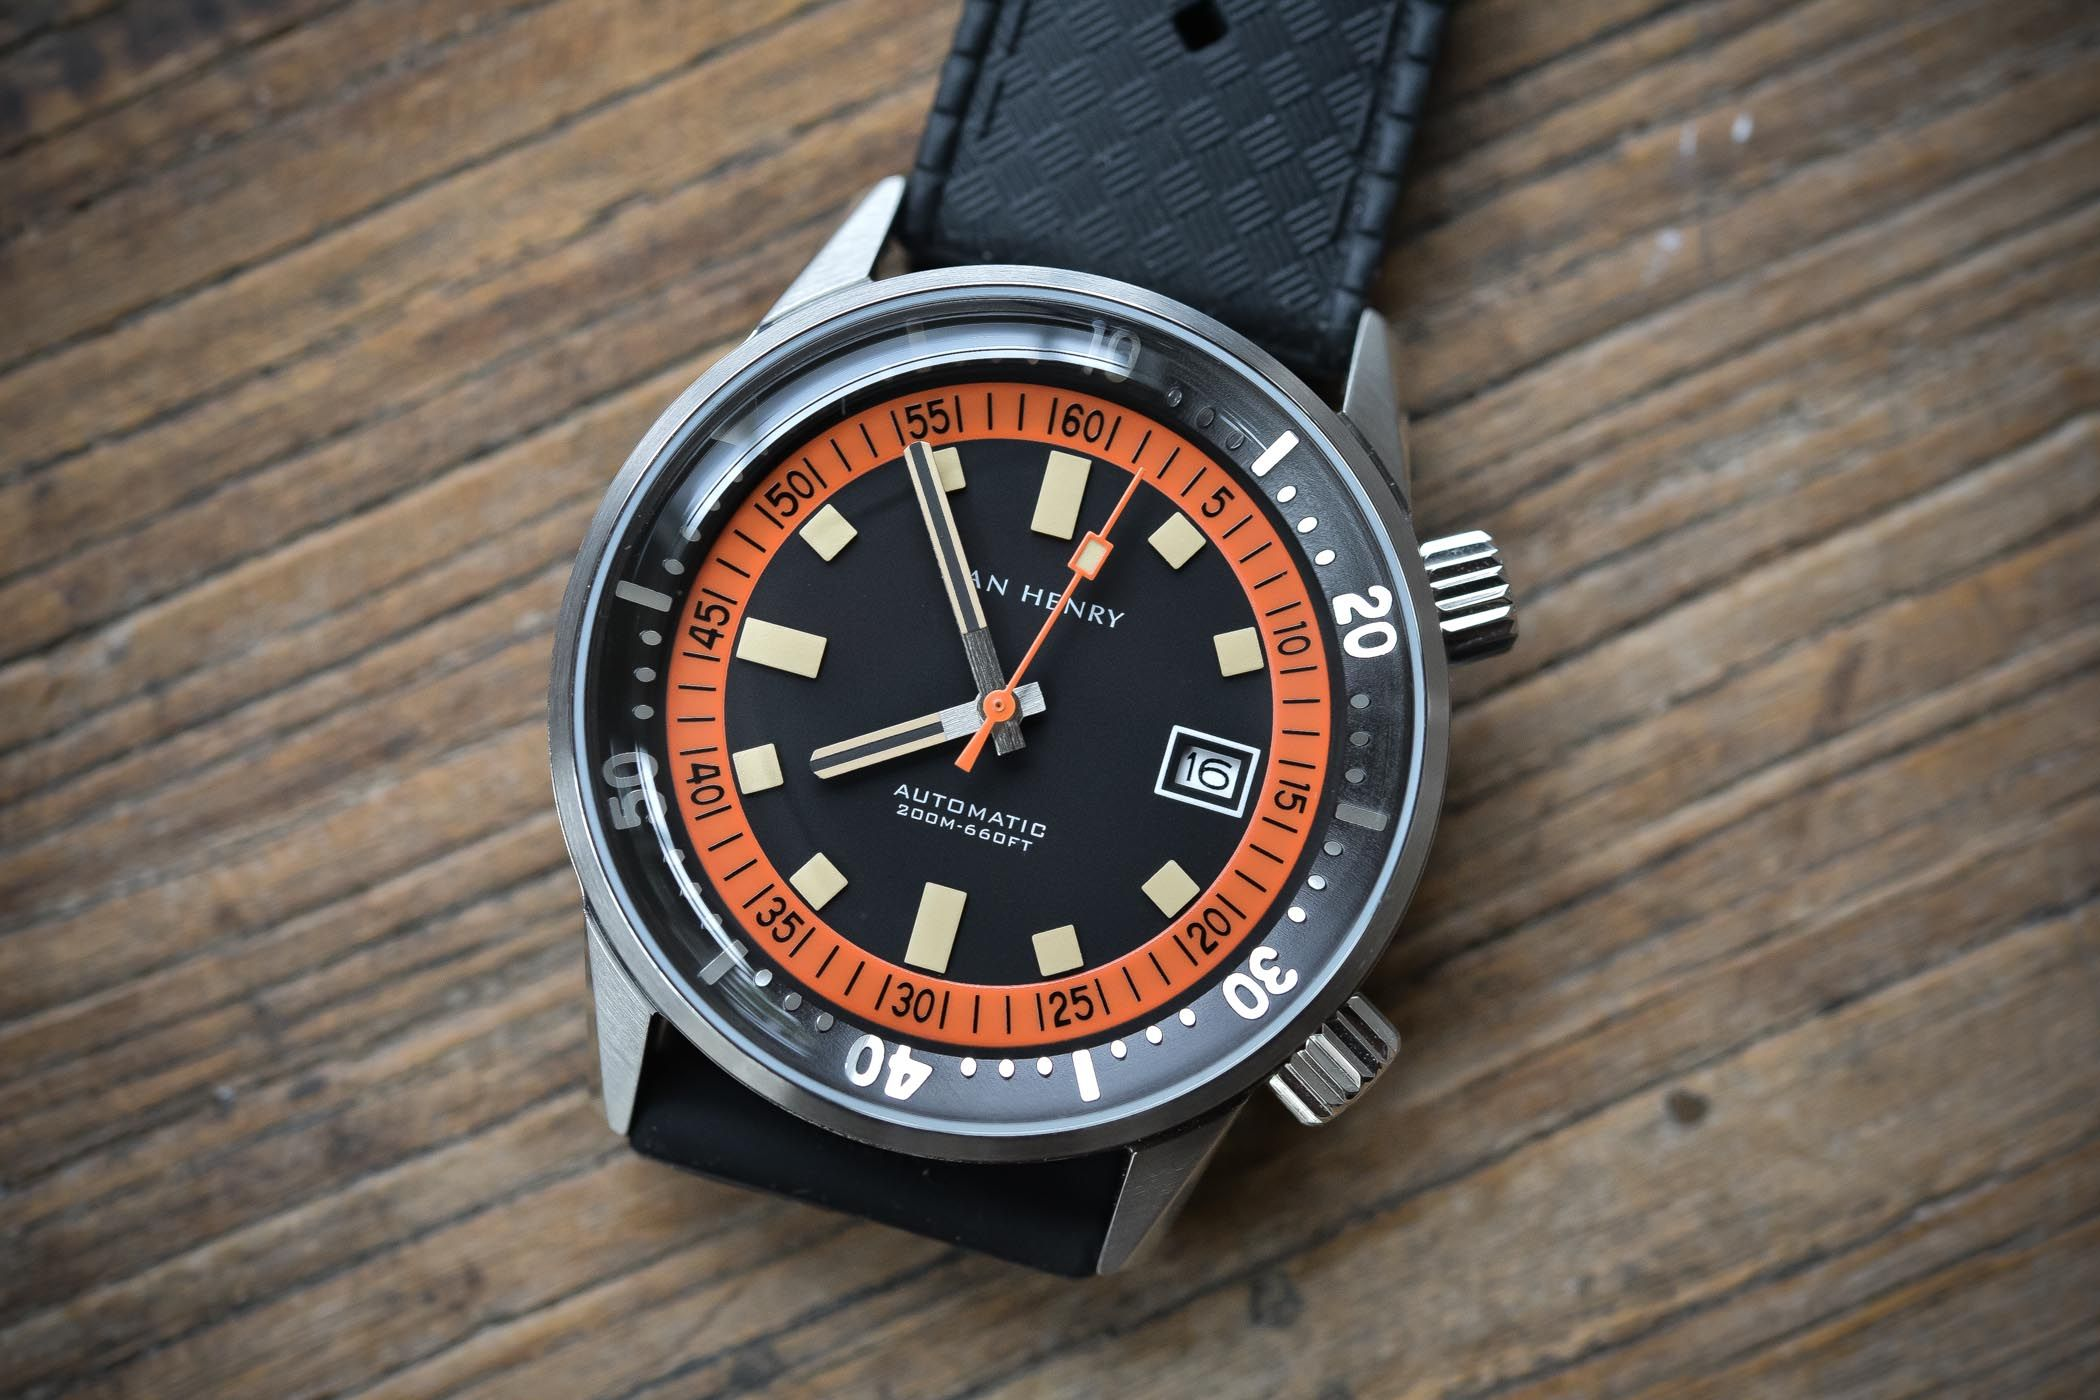 Value Proposition Review Dan Henry 1970 Automatic Diver